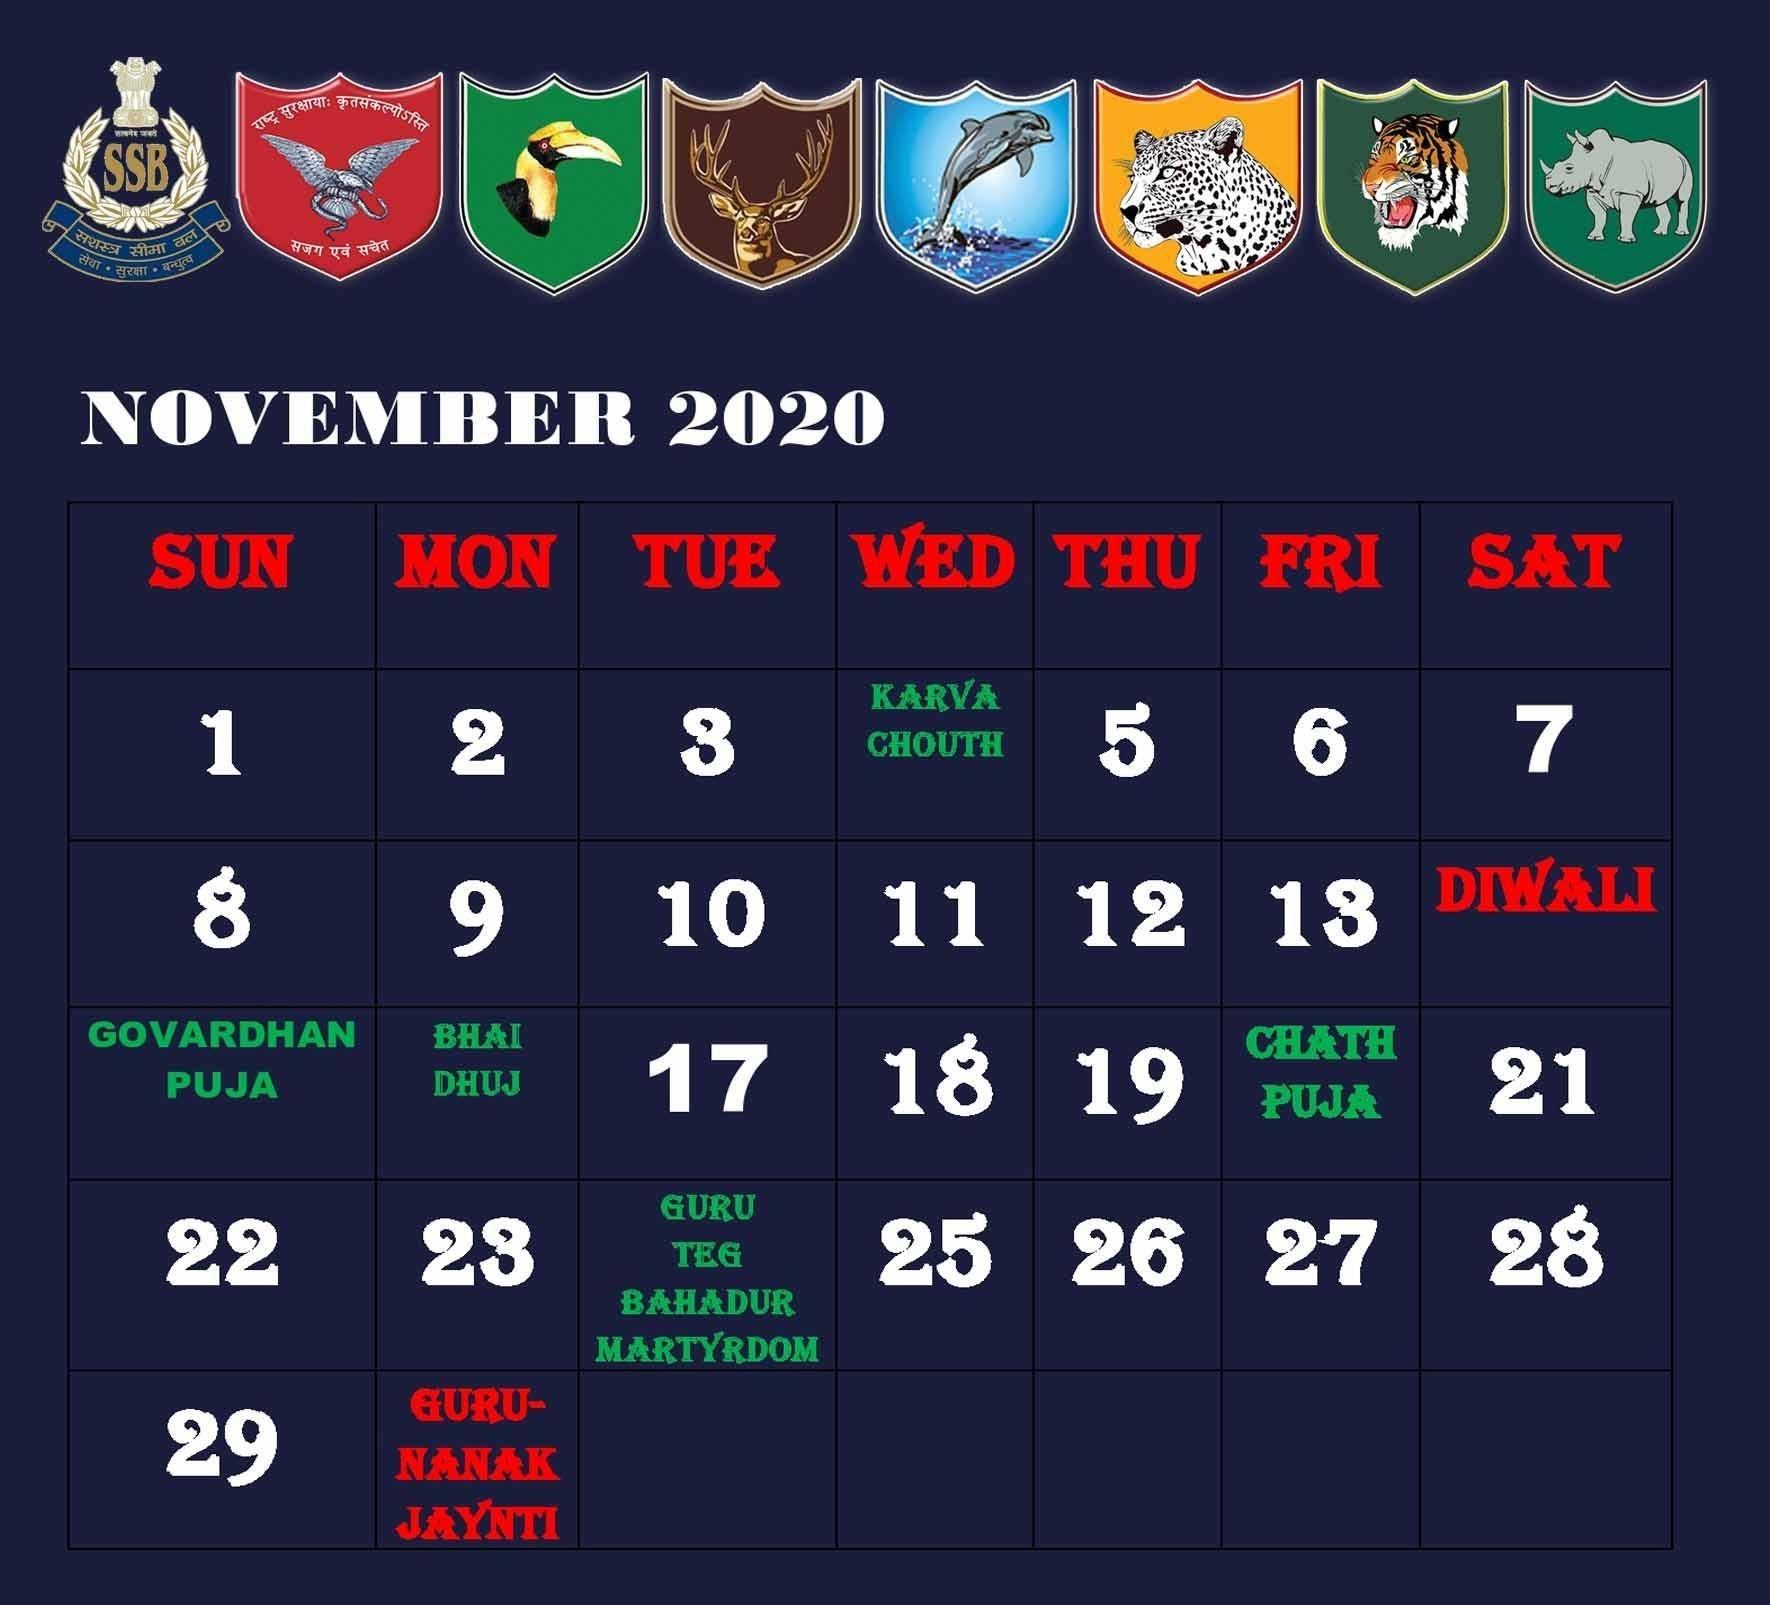 Myssb Calendar 2020 For Android - Apk Download